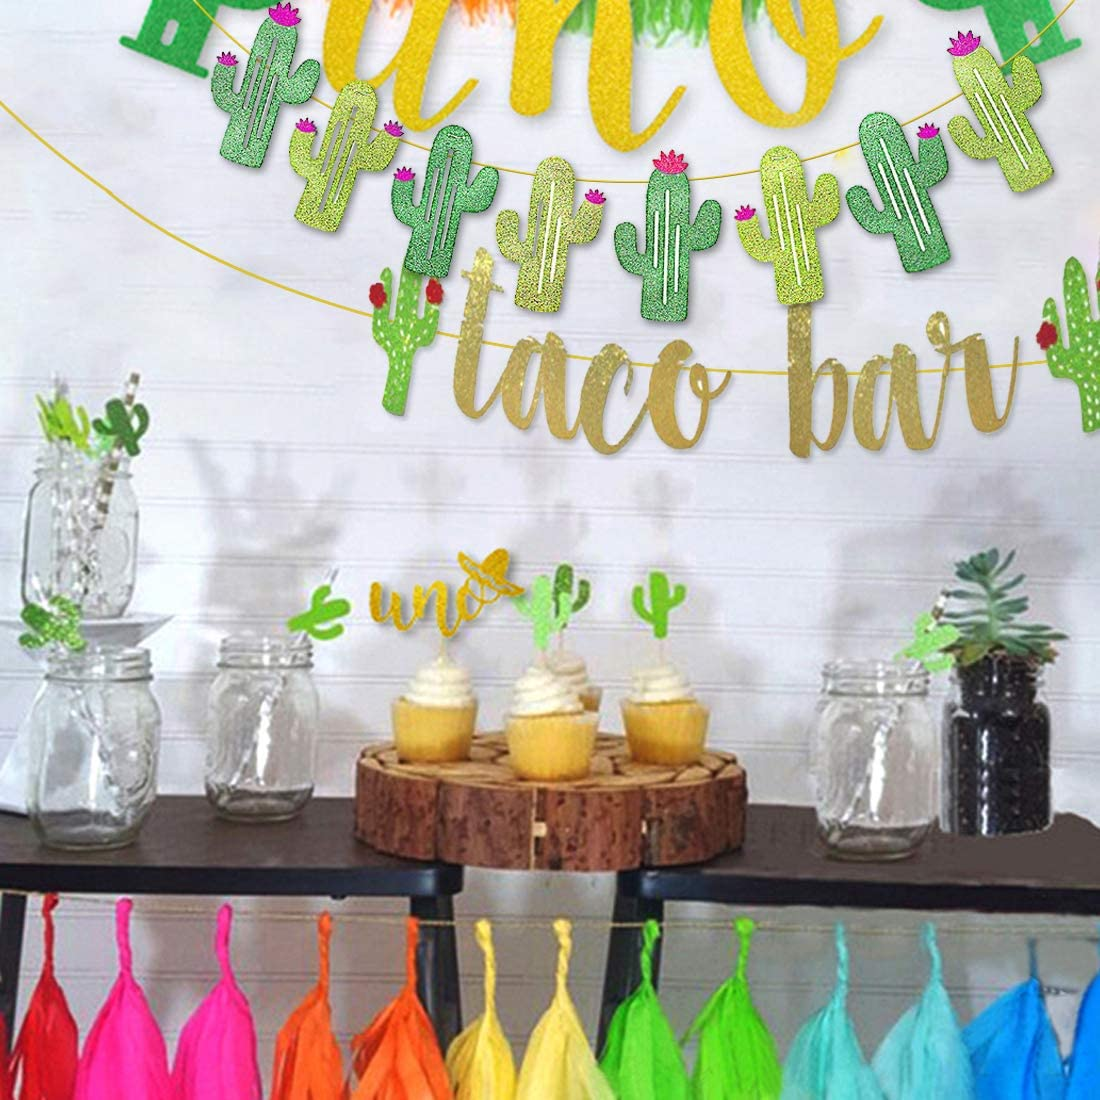 Gold Green Glittery Fiesta Banner for Mexican Fiesta Party Cinco De Mayo Decorations 2 Set Fiesta Taco Bar Cactus Banner Garland